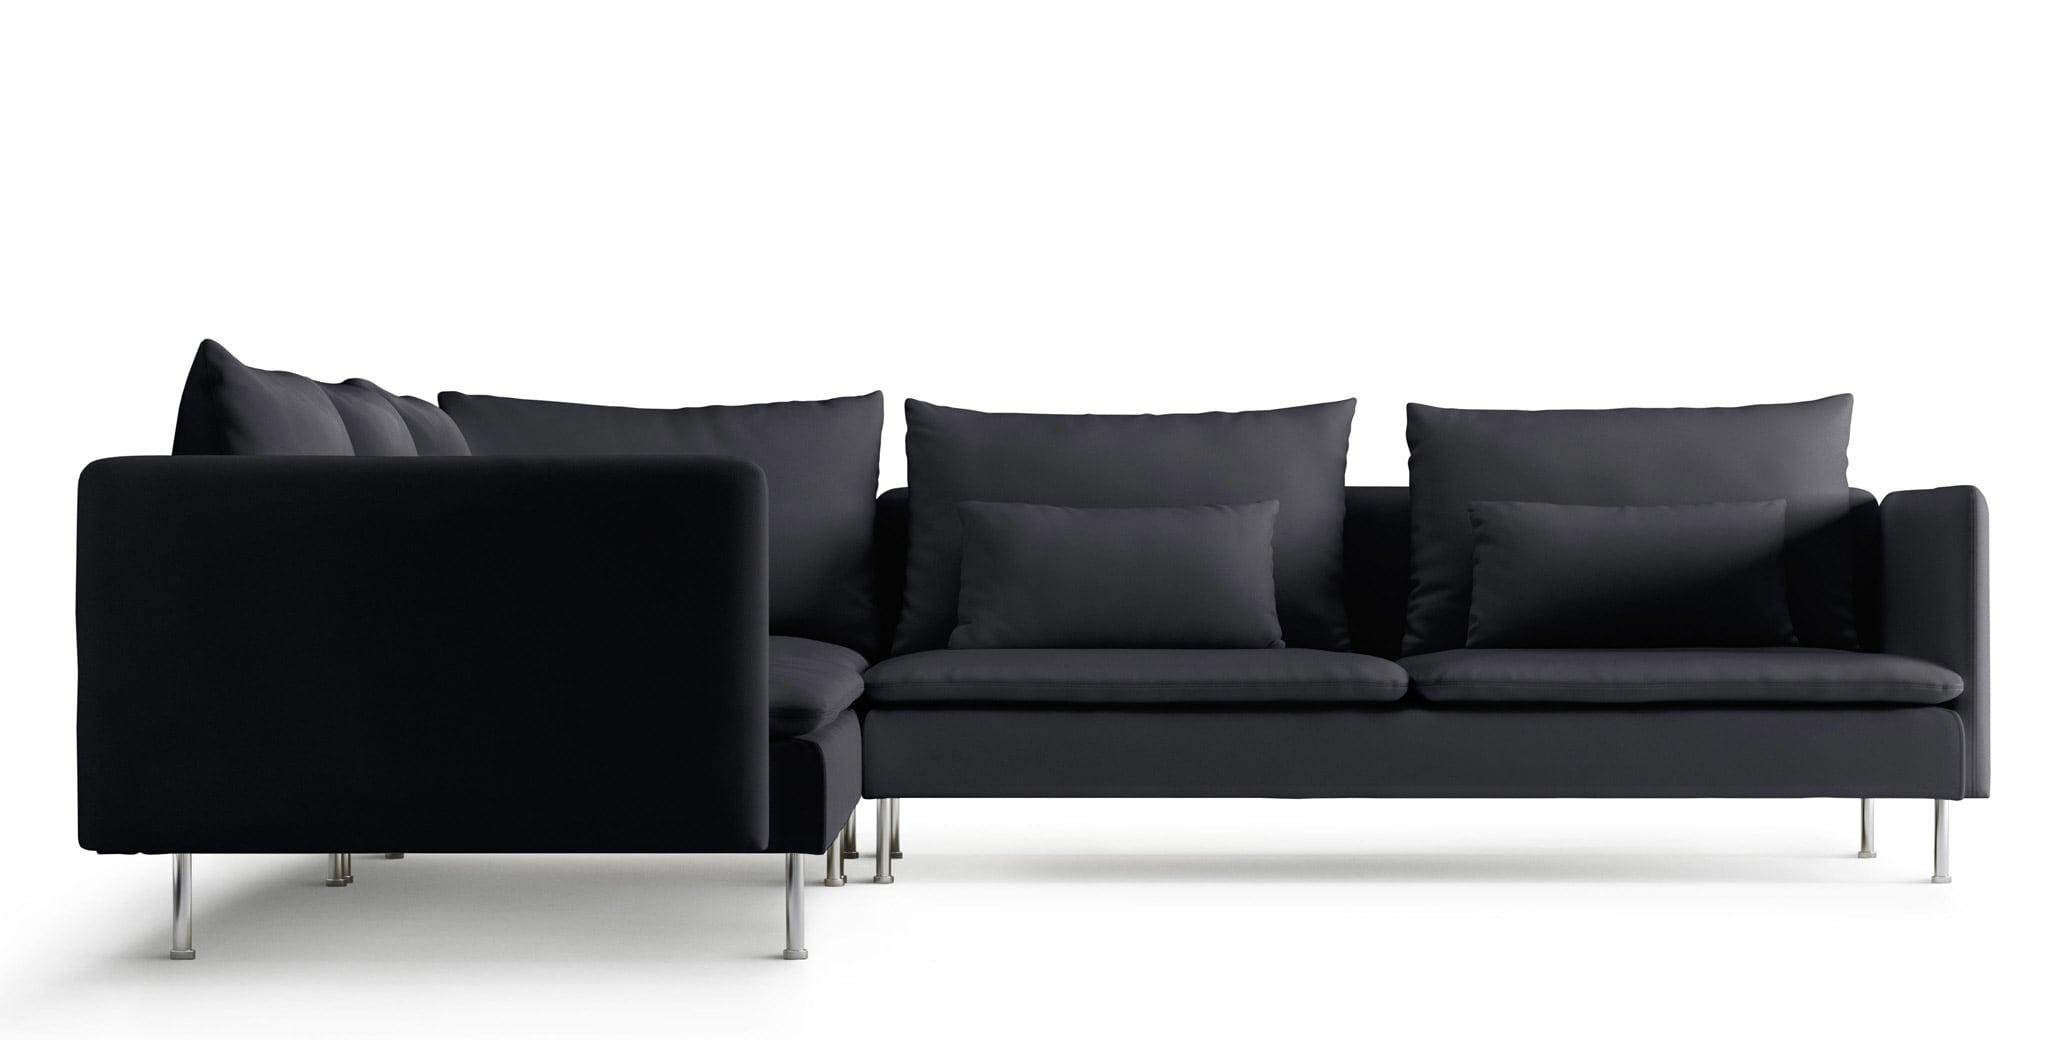 Ikea Fabric Corner Sofas (View 2 of 20)